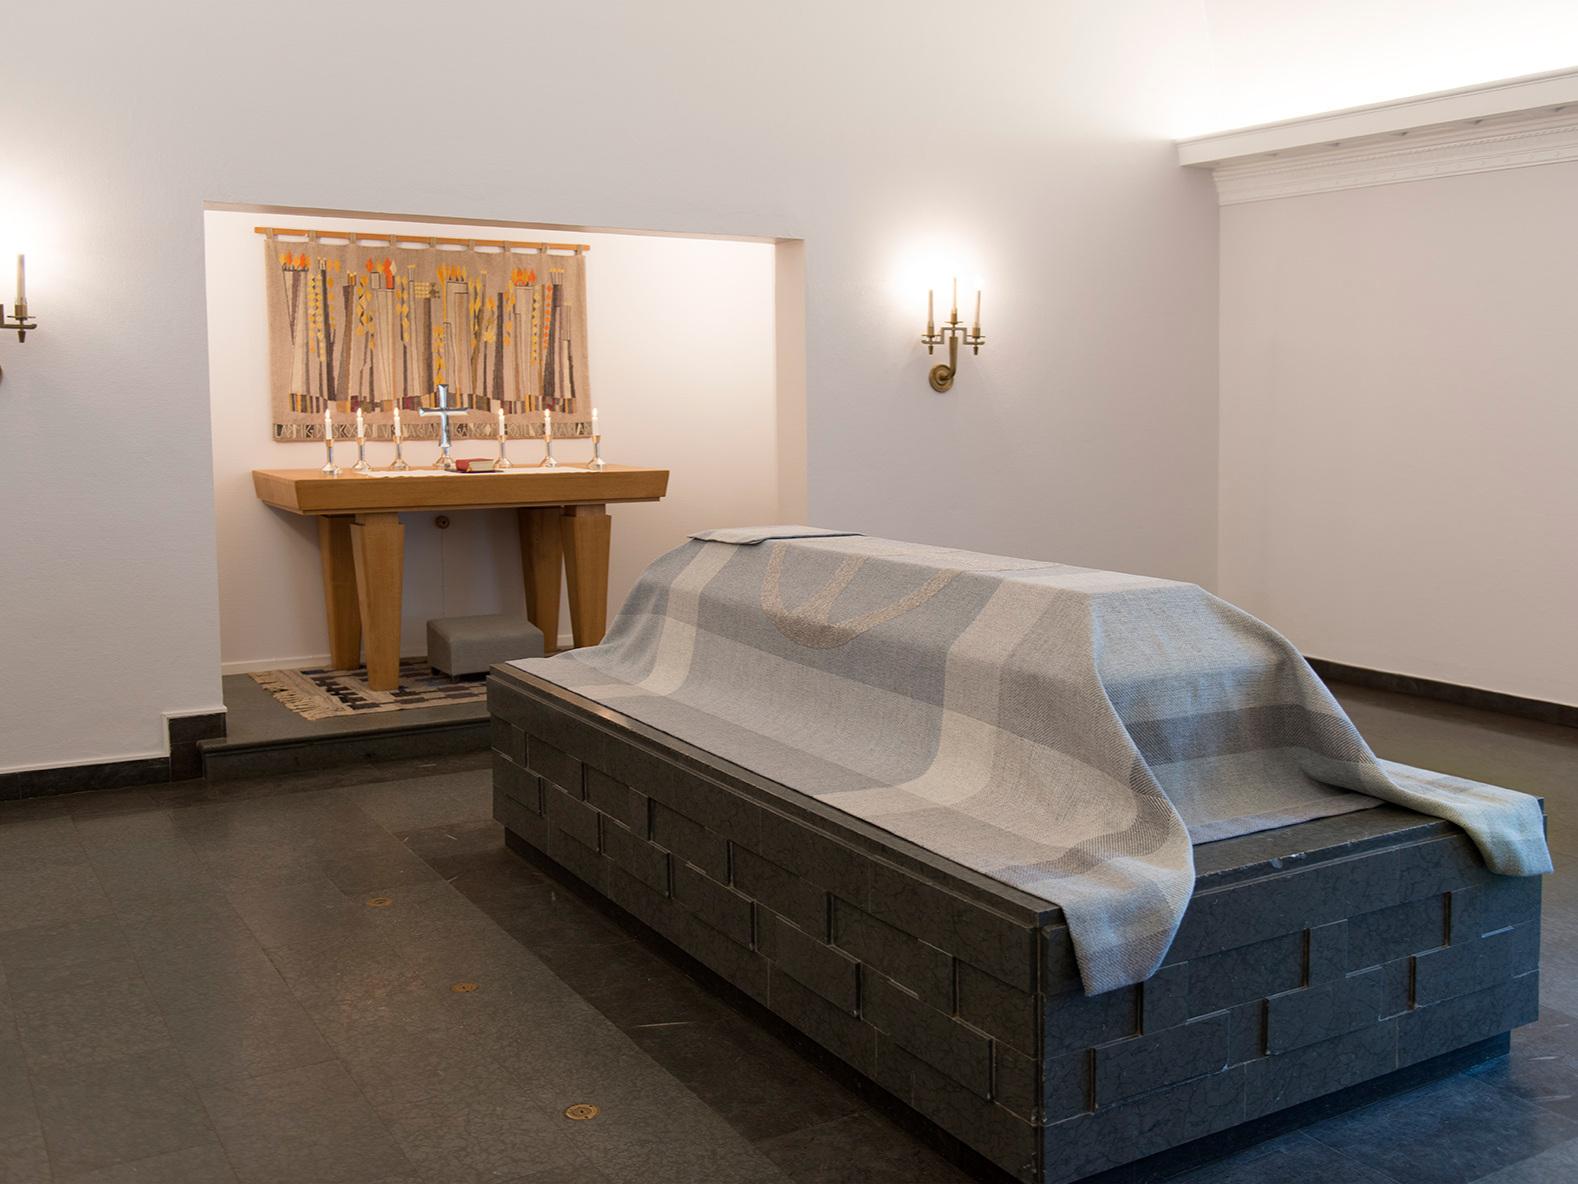 Liturgical textiles -